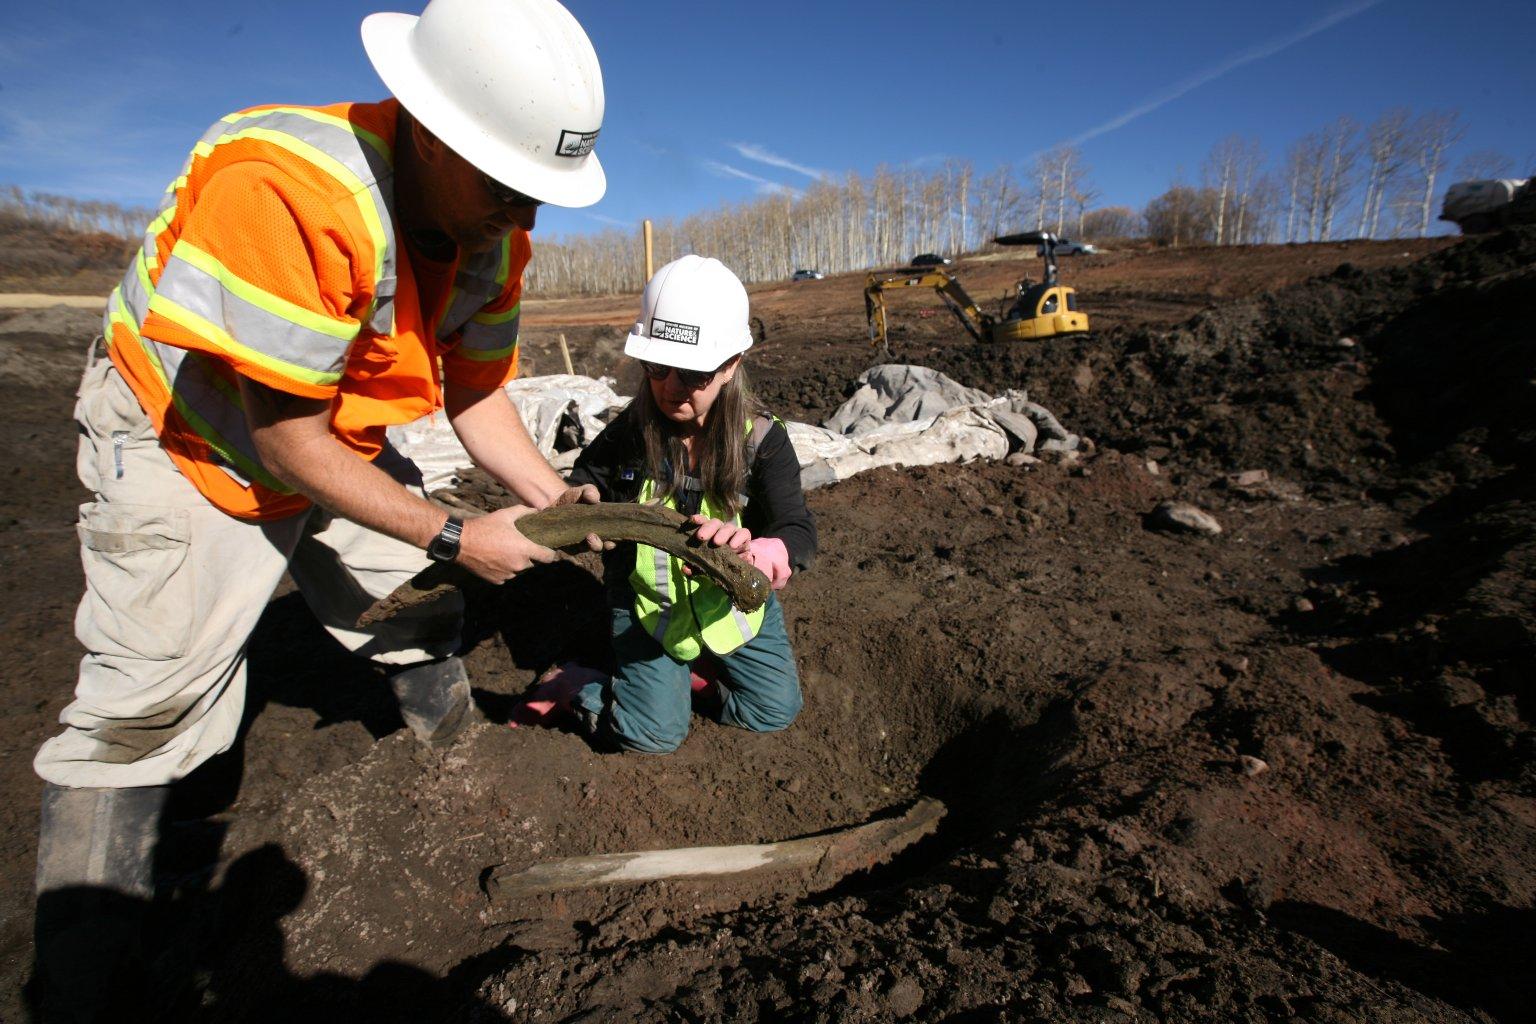 Snowmastodon Excavation and Site, Snowmass Reservoir